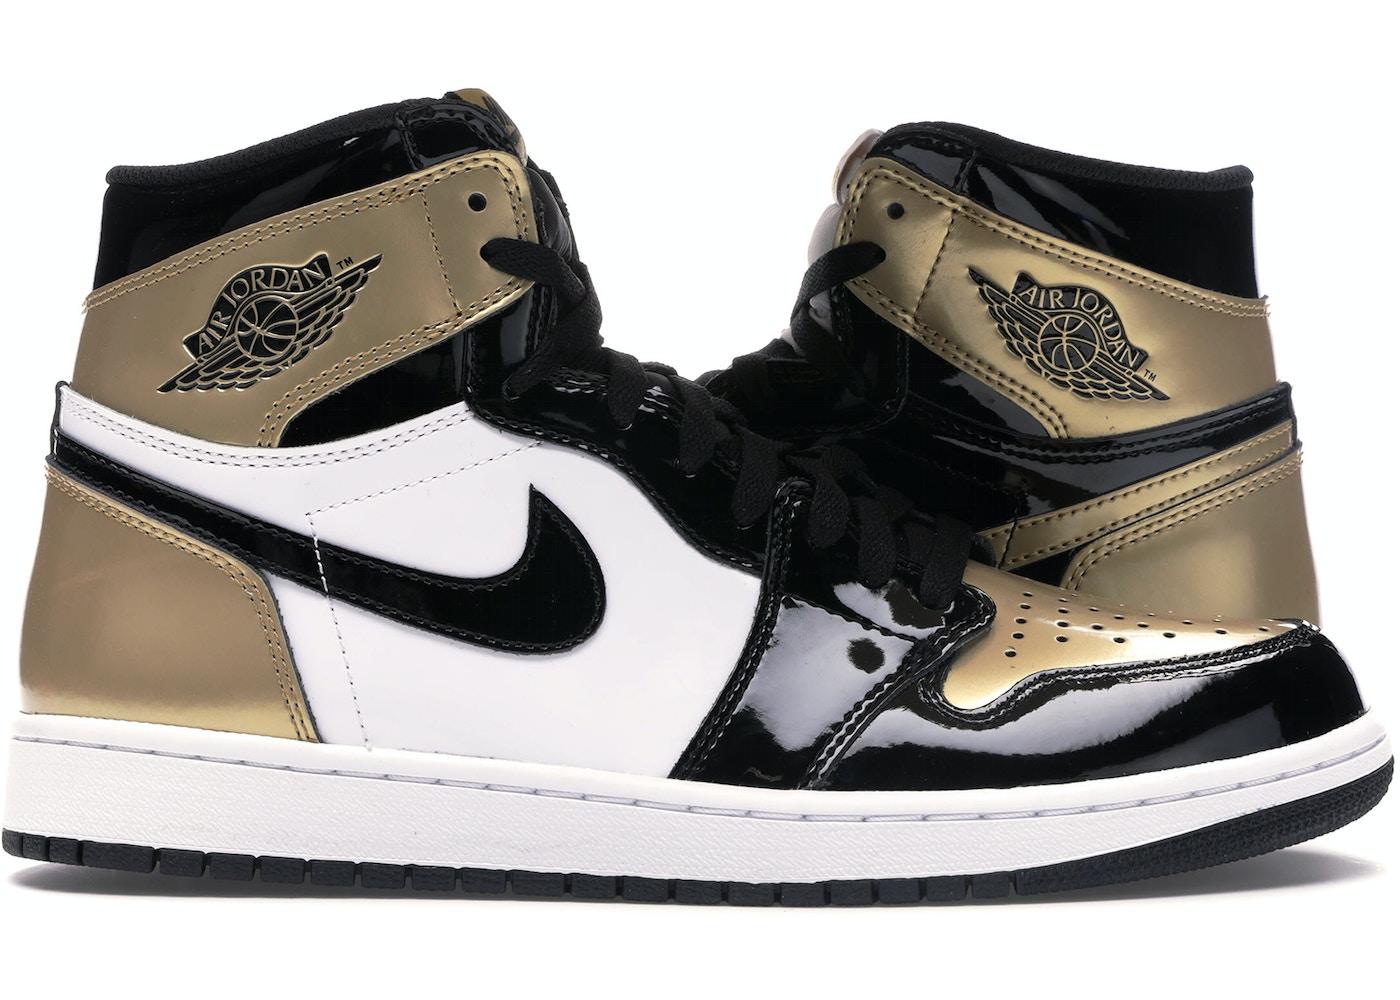 buy online 7bd56 f38b8 Jordan 1 Retro High Gold Top 3